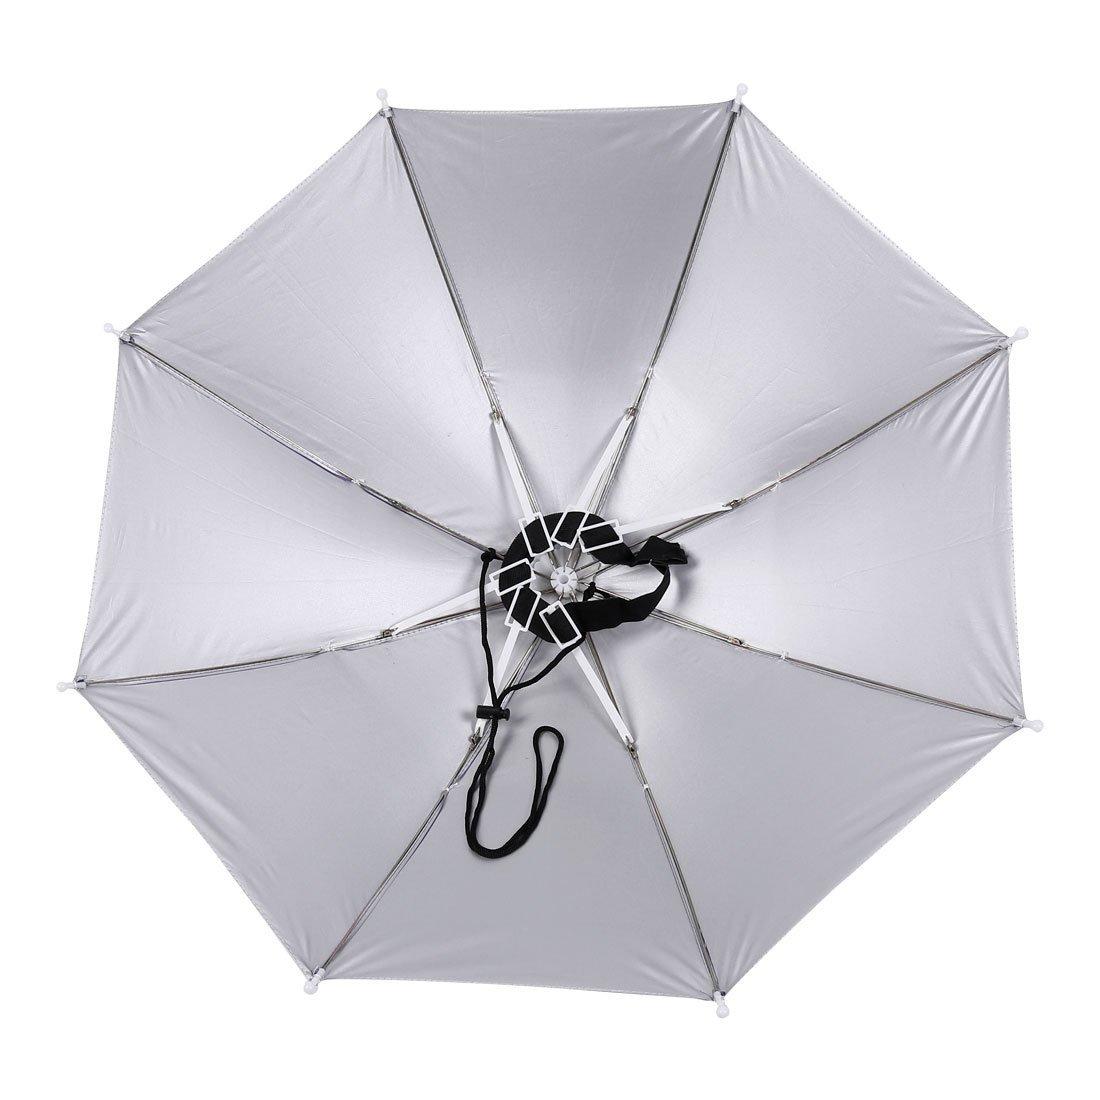 Amazon.com: eDealMax Manos libres Banda elástica paraguas Sombrero Headwear de deportes al aire Libre púrpura: Home & Kitchen